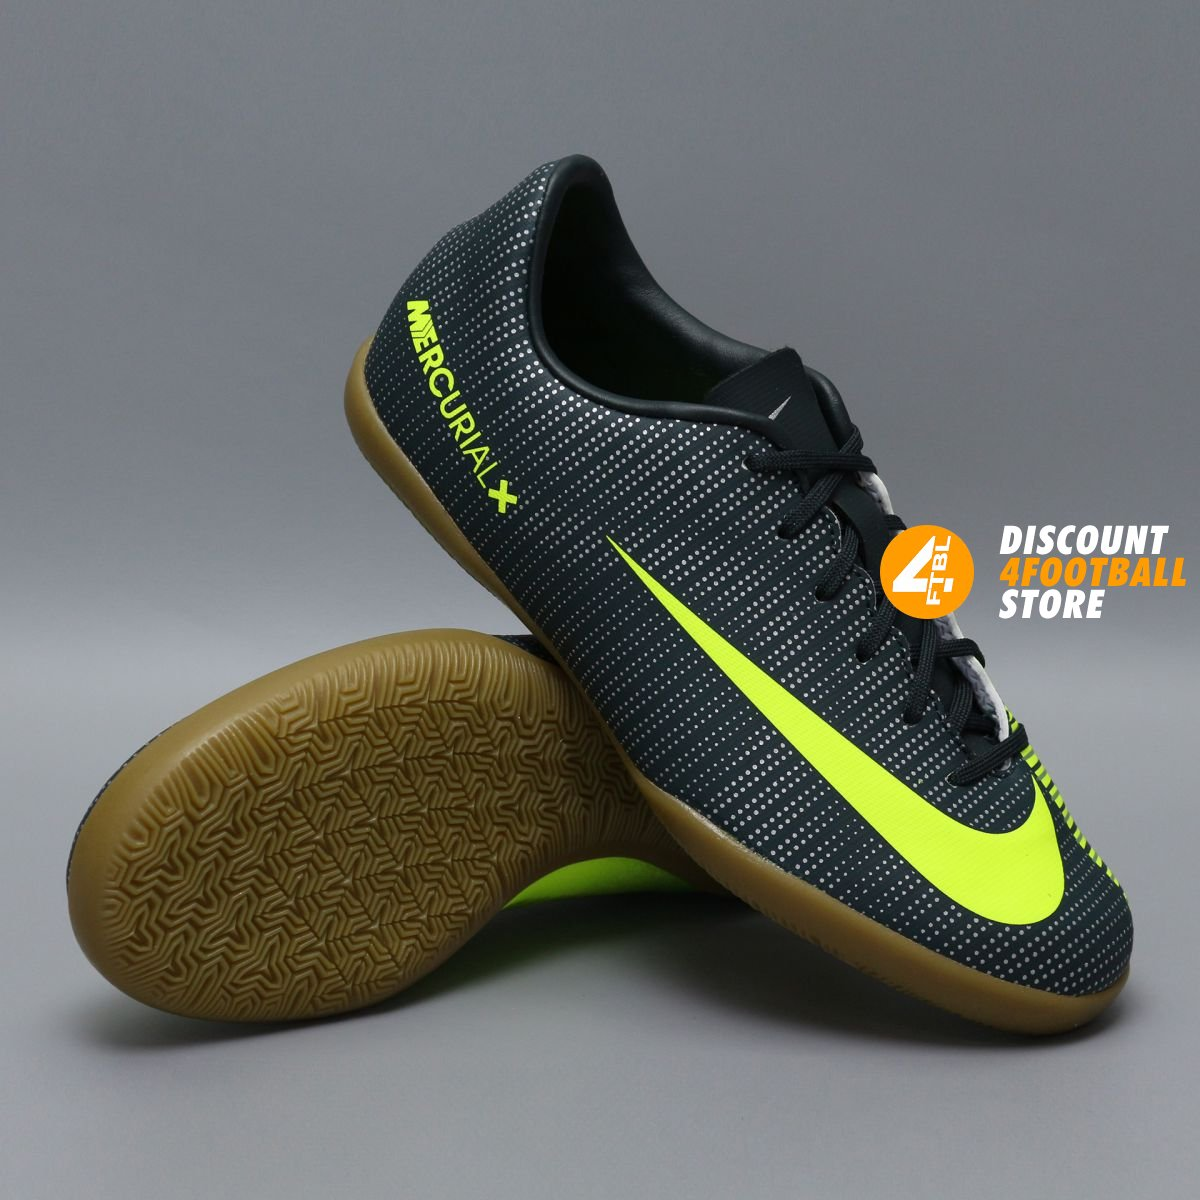 Детские футзалки Nike Ronaldo CR7 JR MERCURIALX VAPOR XI IC   852488-376 8ff71f11e0a